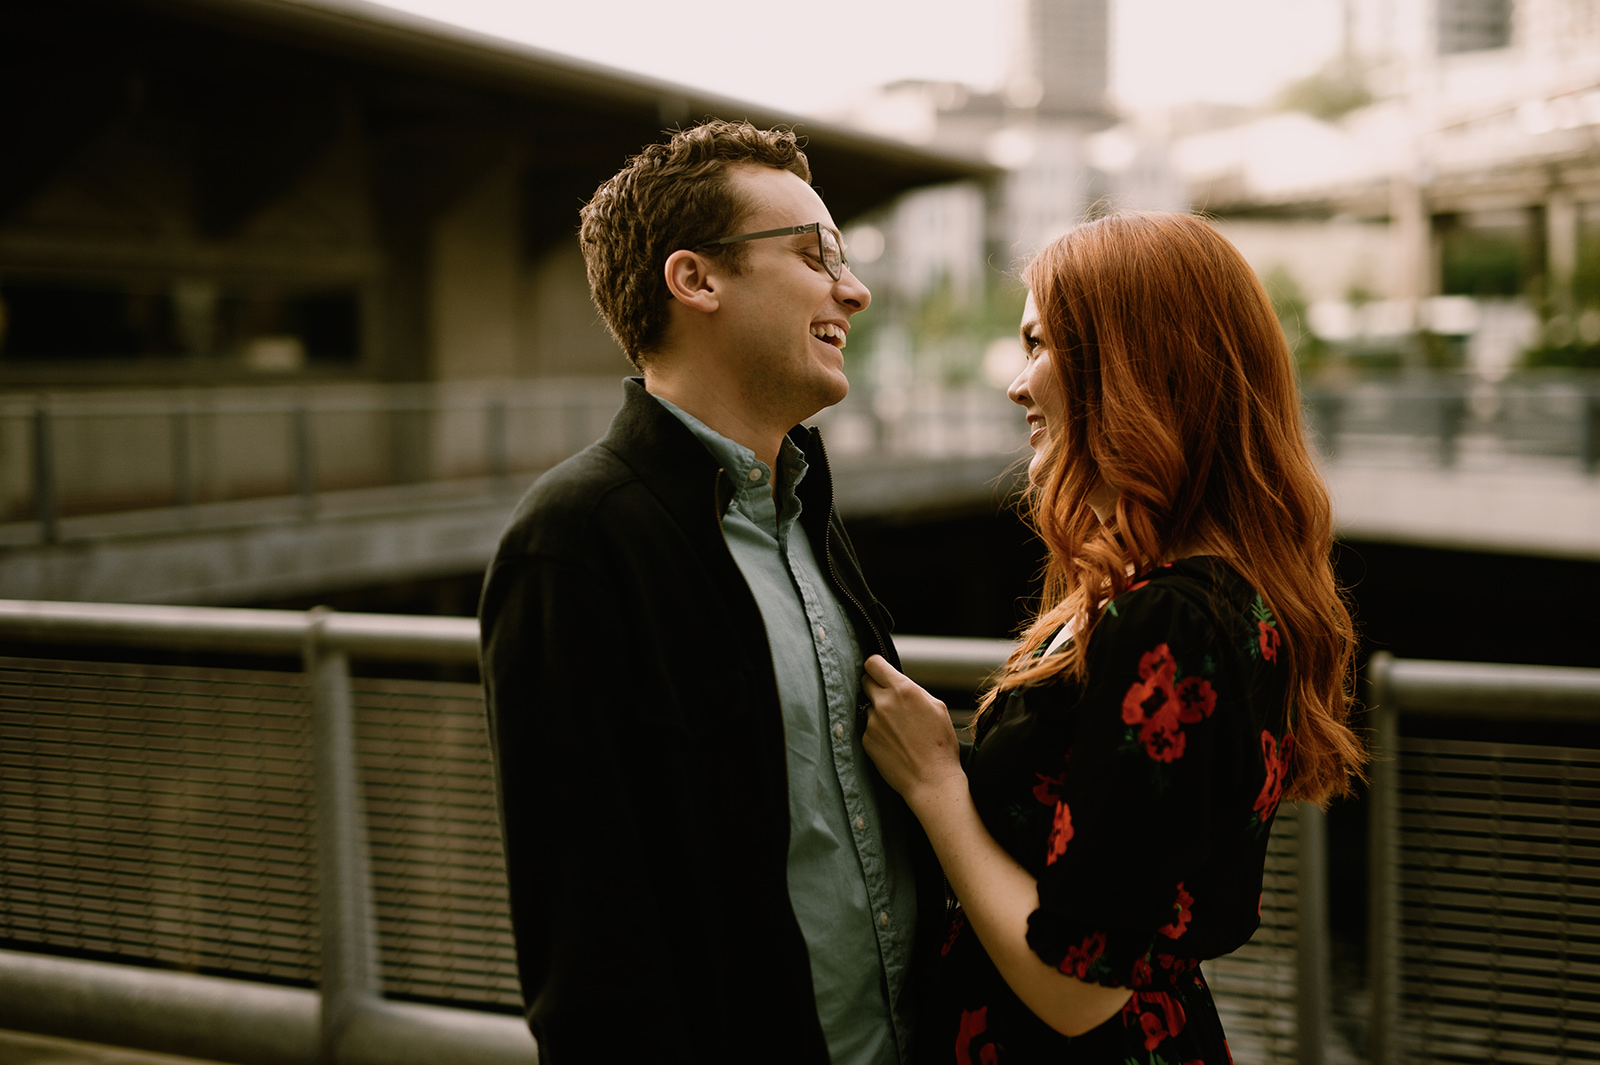 Rebecca-Christian-Engagement-Carly-Bish-Photography-54.jpg